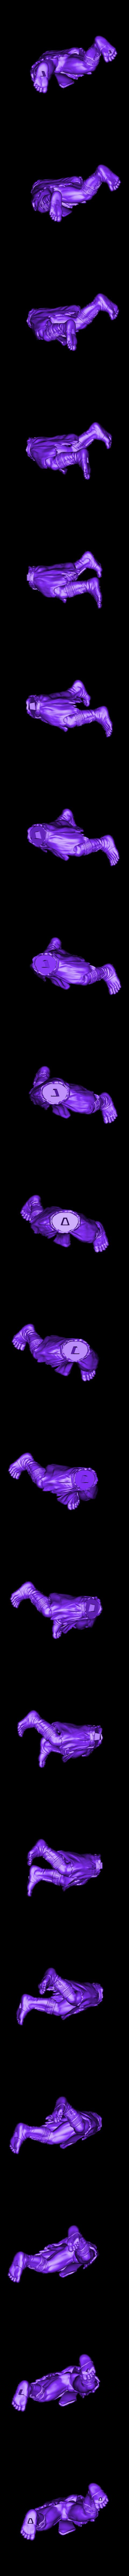 necalli_080730_legs.stl Download free STL file Stronghero Necalli street fighter • 3D printing design, stronghero3d